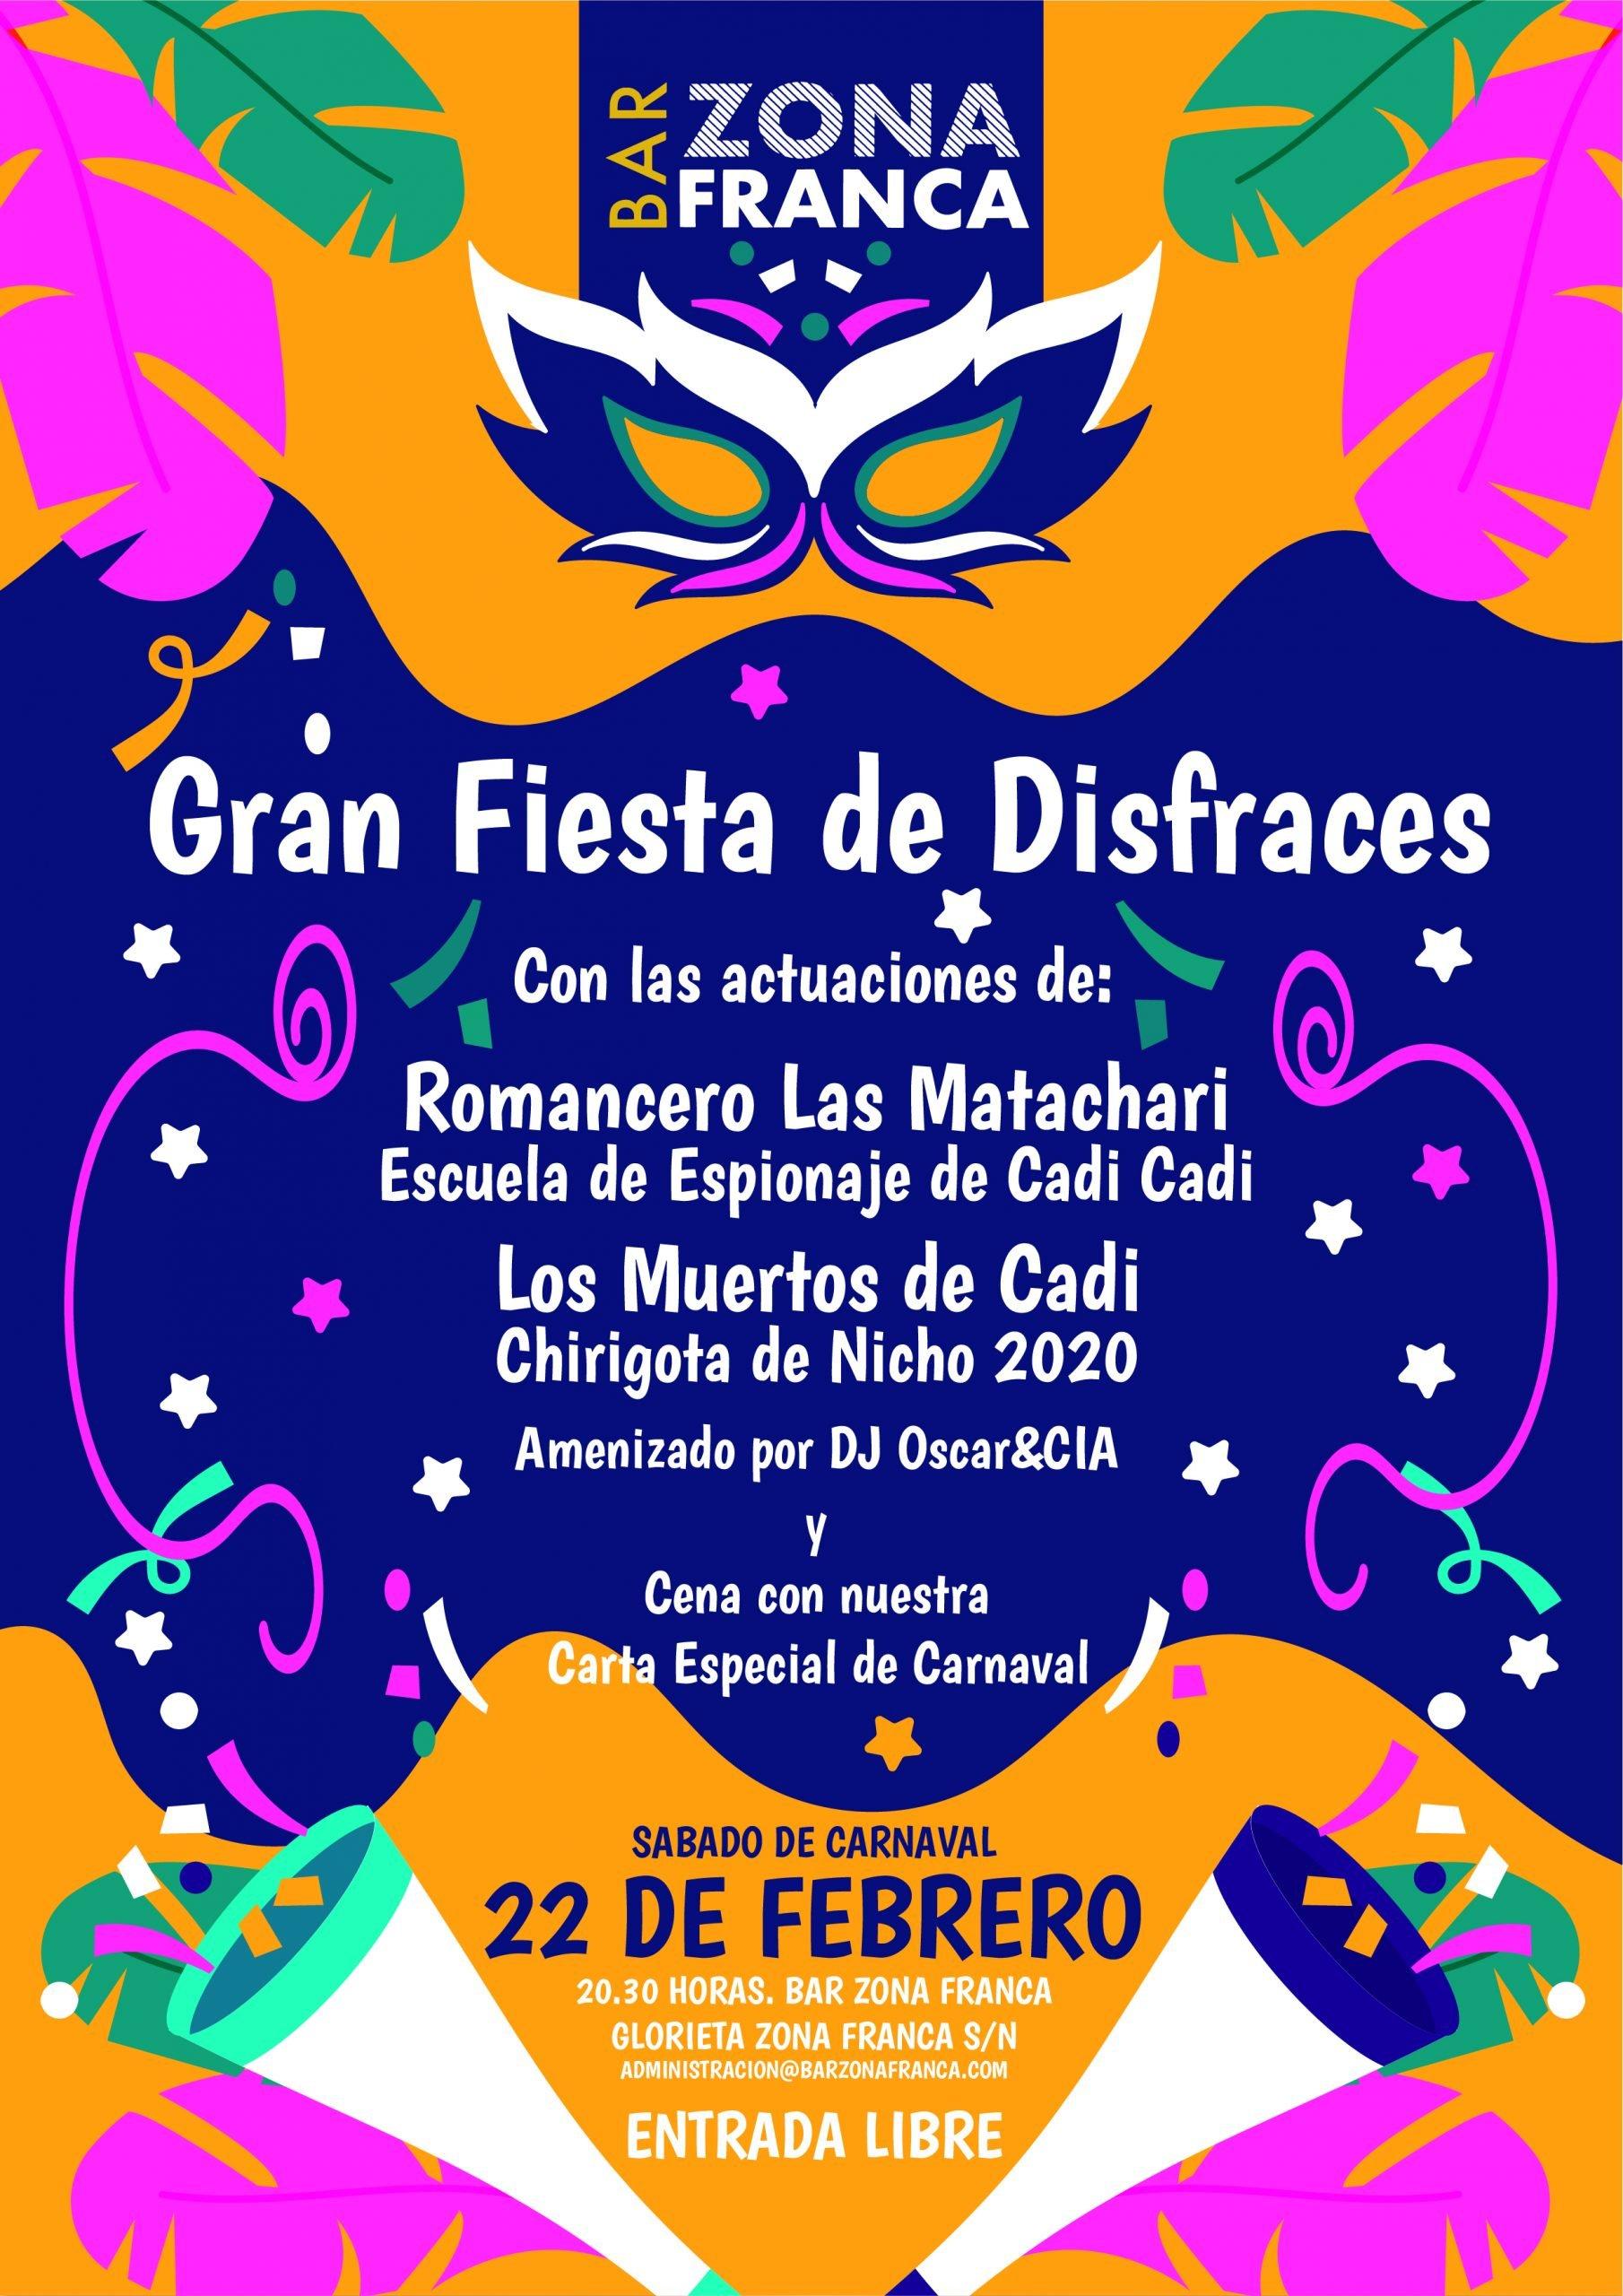 Fiesta de disfraces. Carnaval 2020